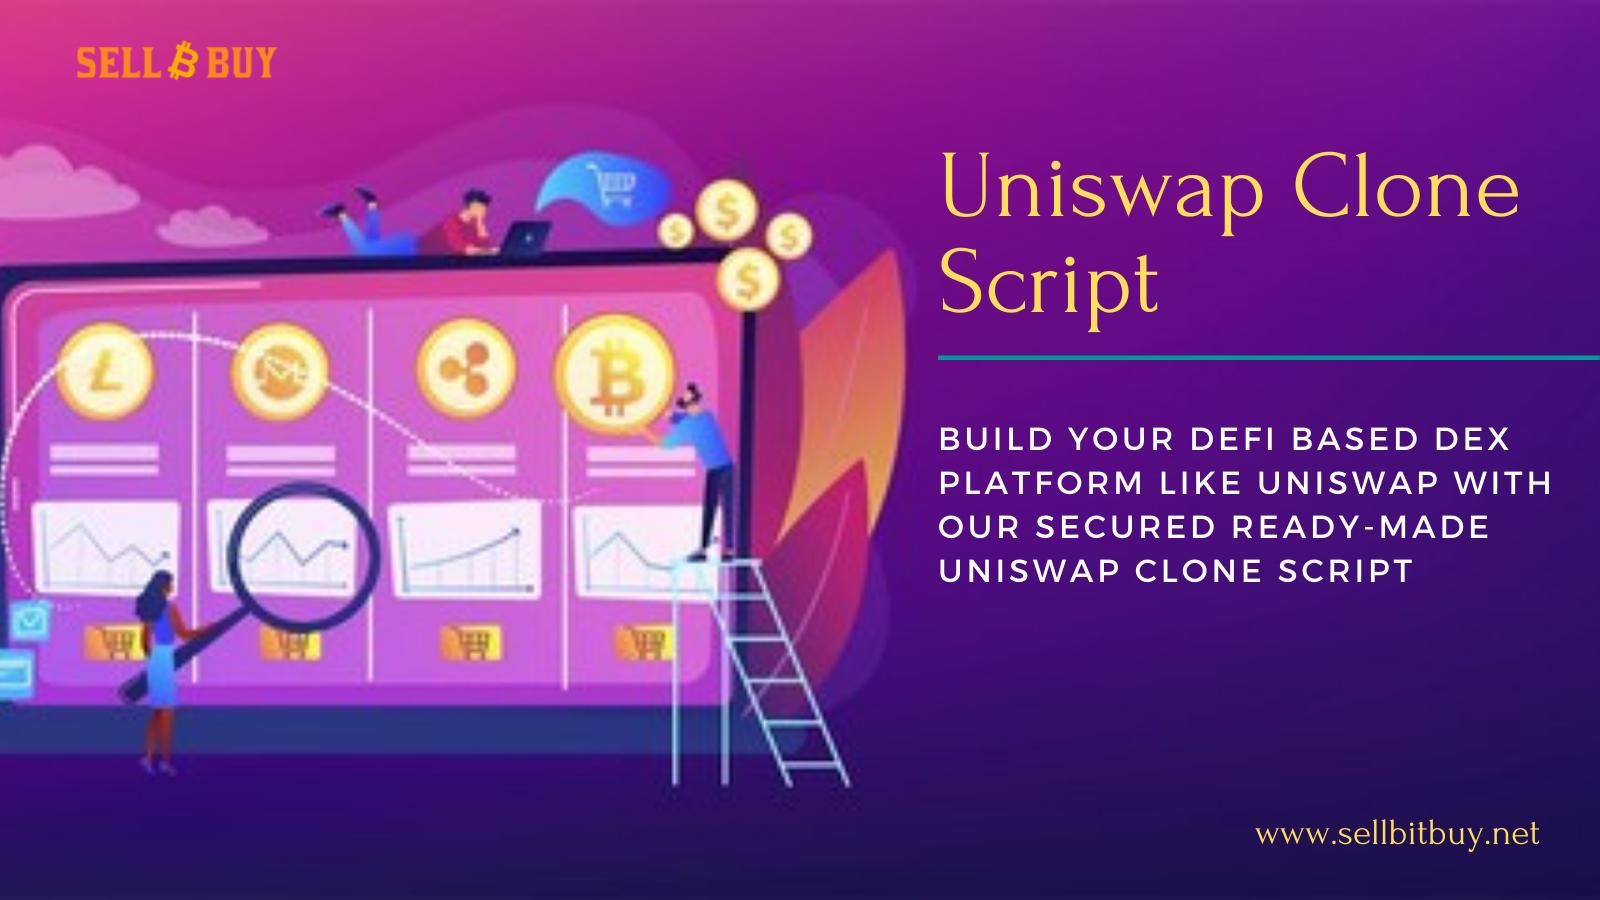 Steps To Start A Uniswap like P2P exchange On DeFi Platform   Start as a Business